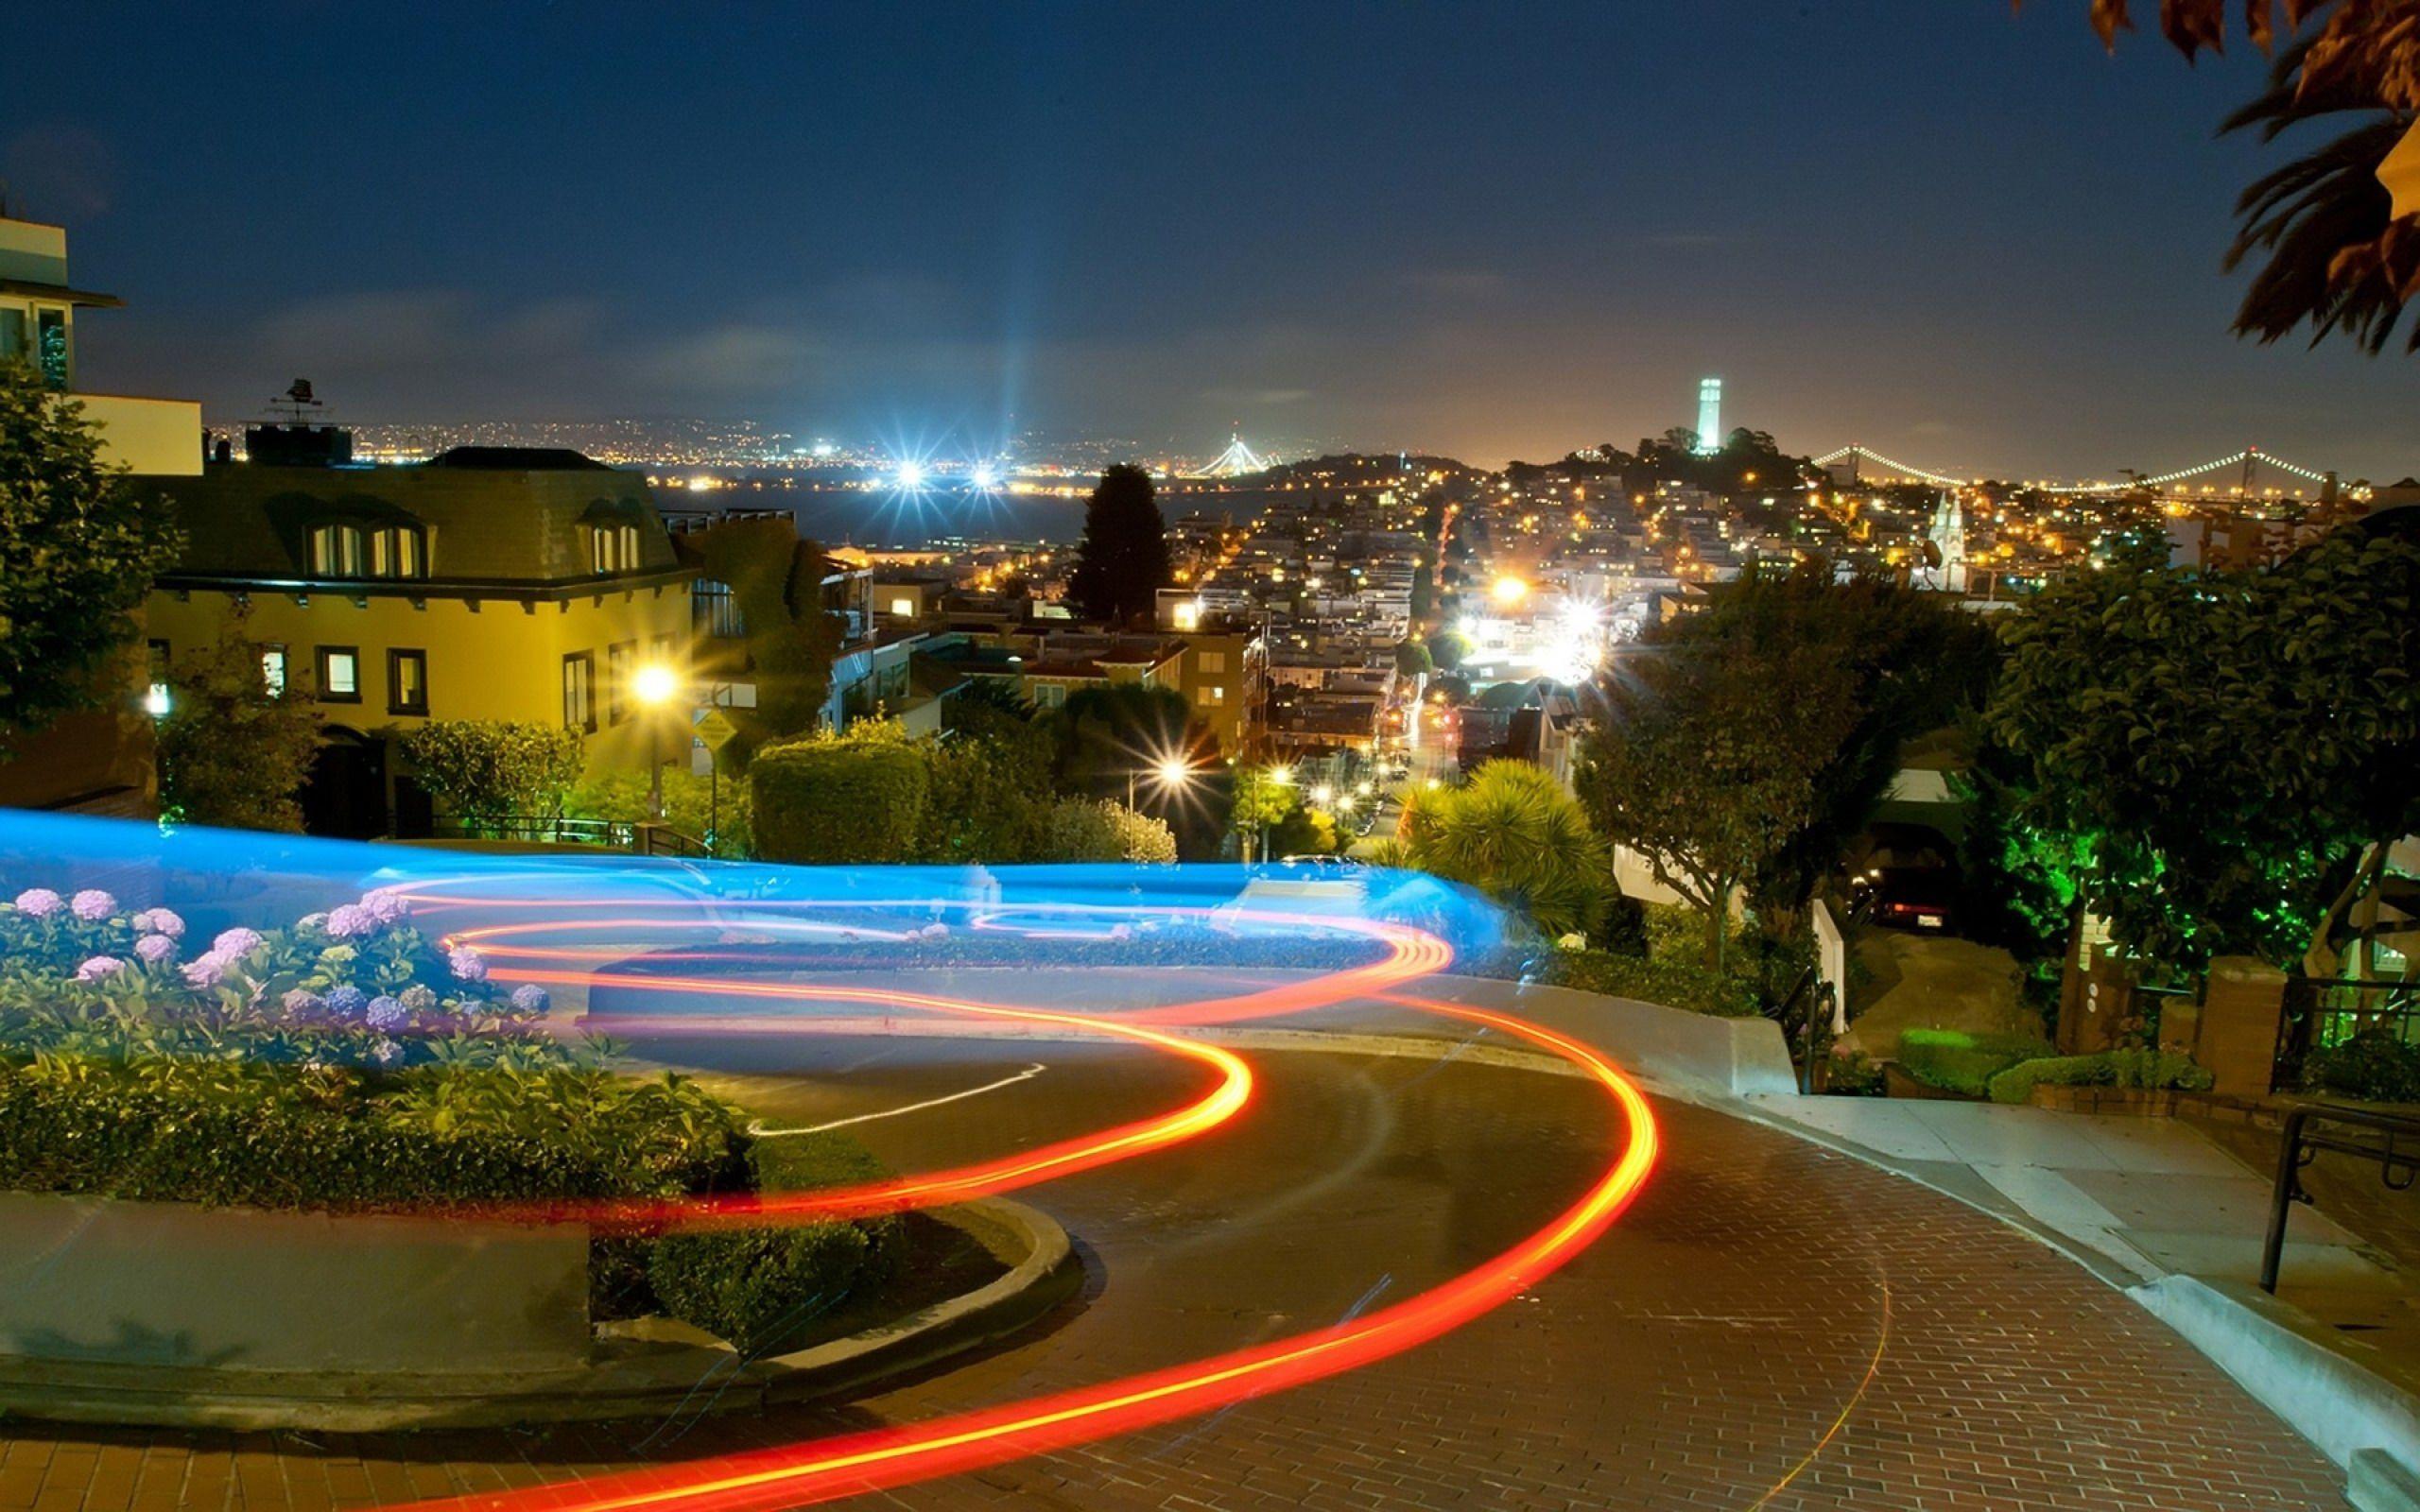 Lombard-Street-San-Francisco.jpg